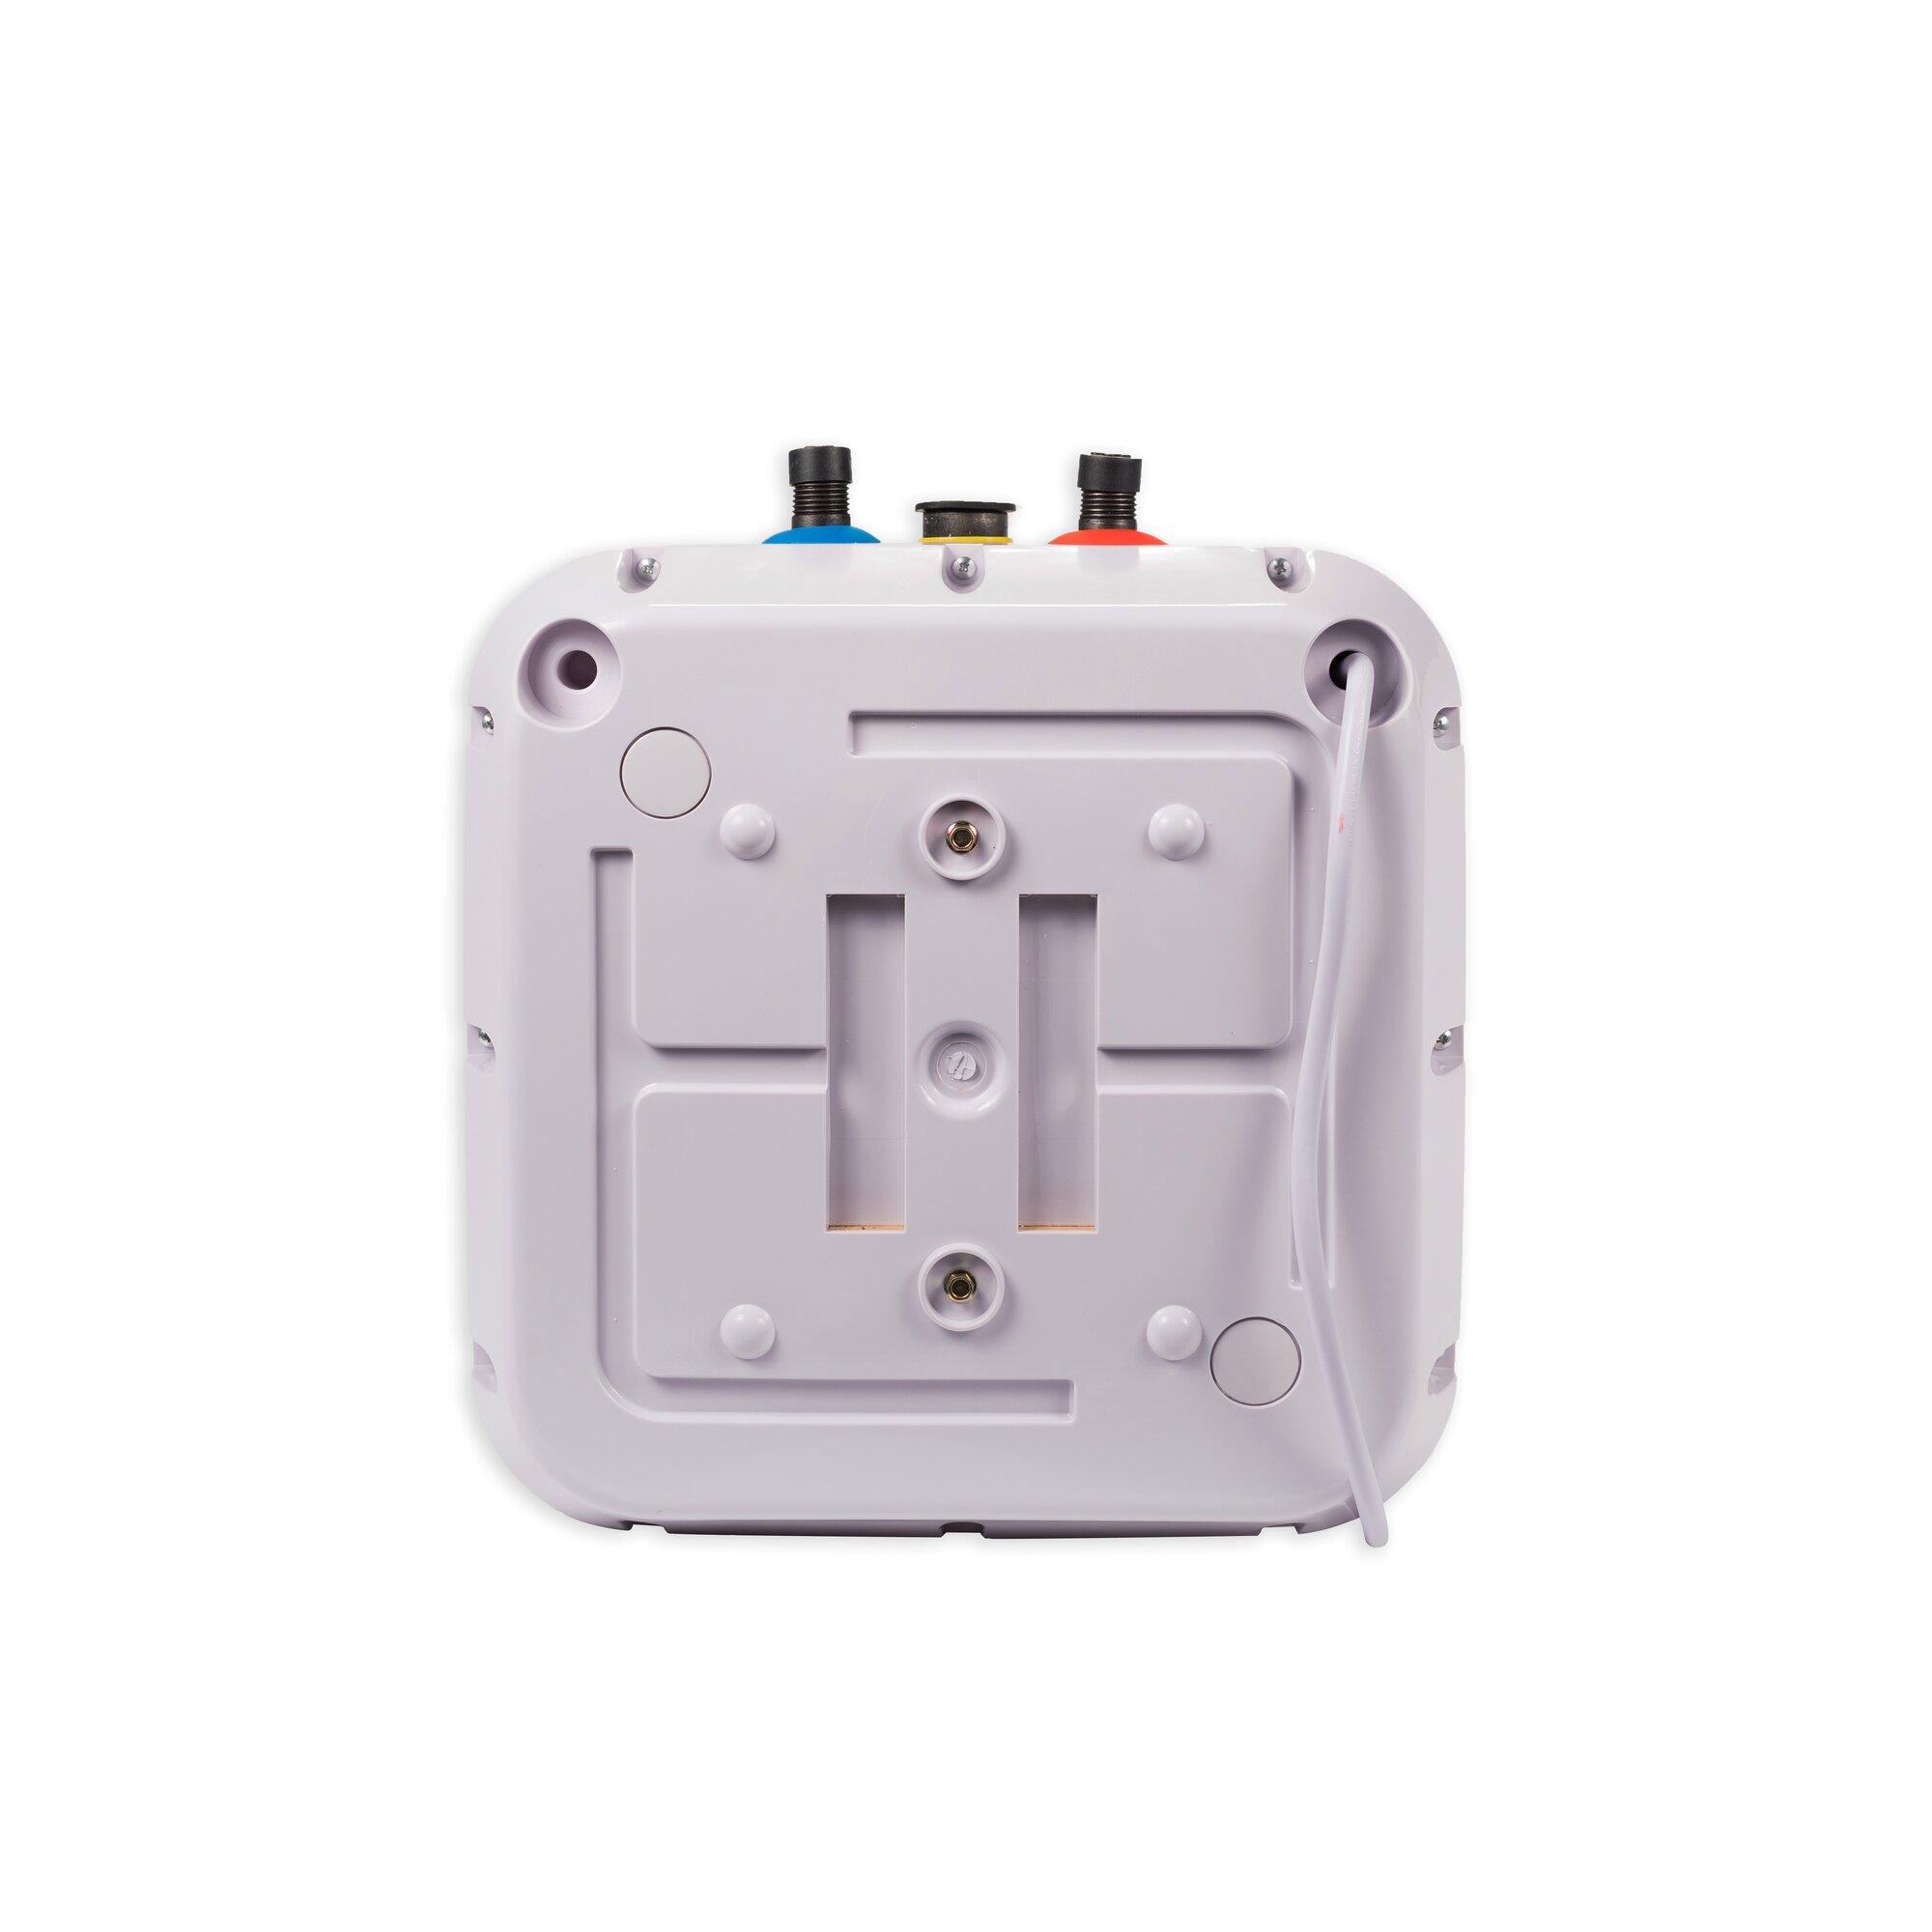 25 Gallon Mini Tank Water Heater